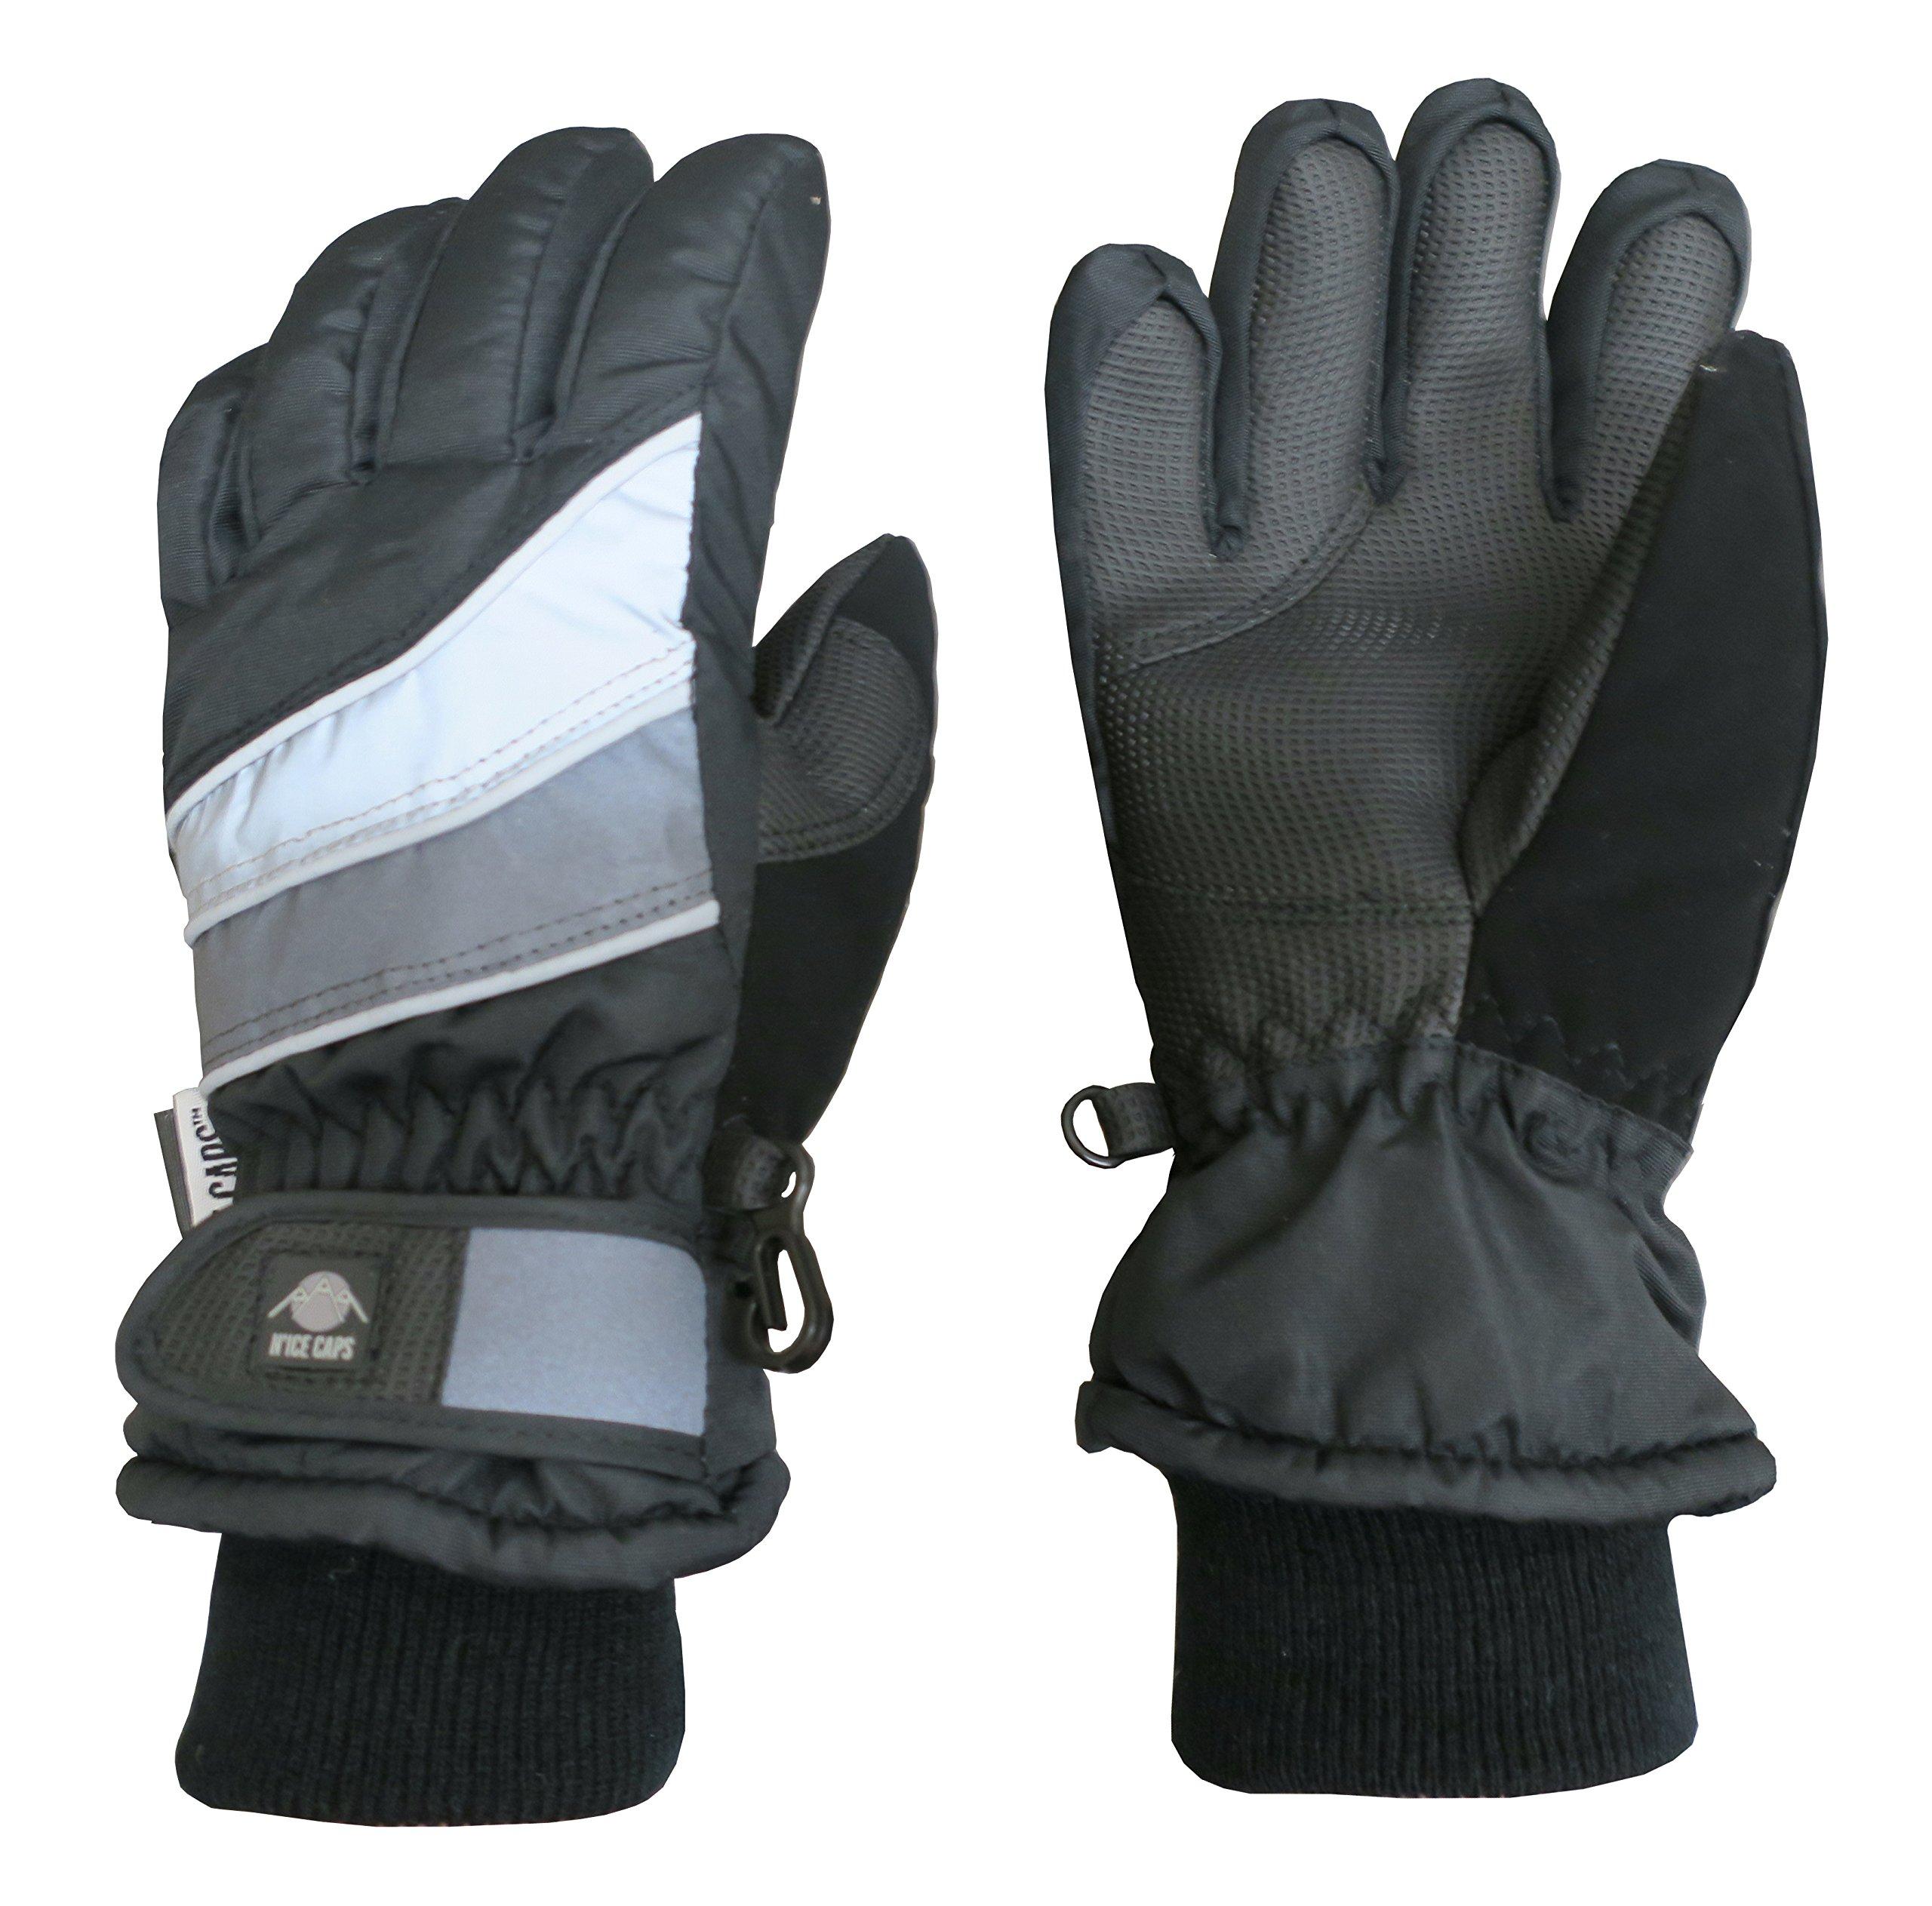 N'Ice Caps Kids Bulky Thinsulate Waterproof Winter Snow Ski Glove With Ridges (3-4yrs, Black/Grey Colorblock)